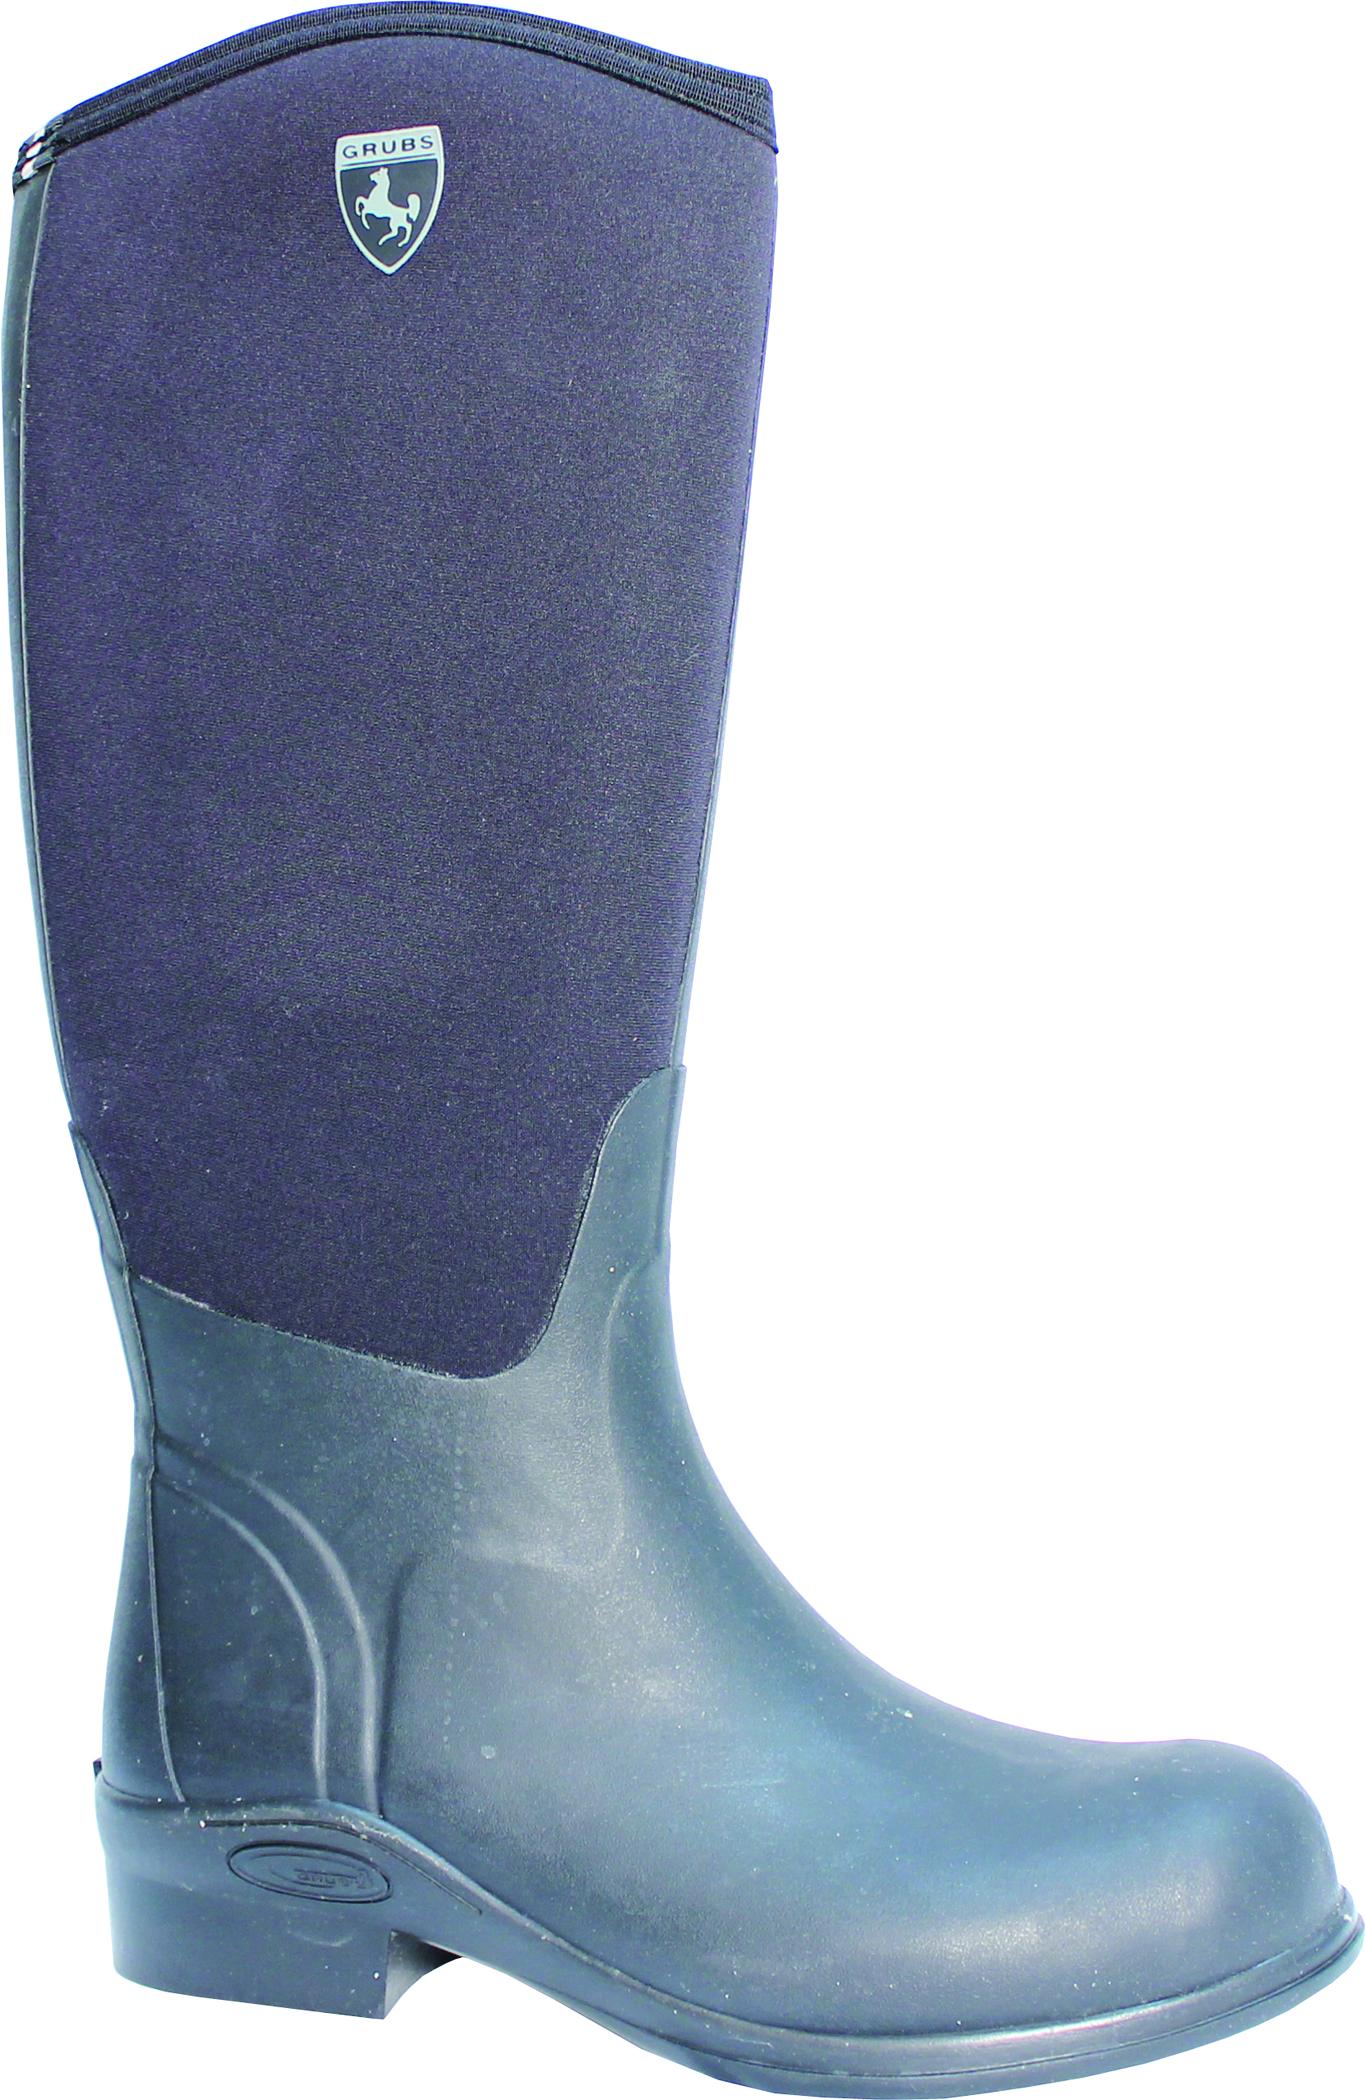 Grub's Rideline 5.0 Women's Boot